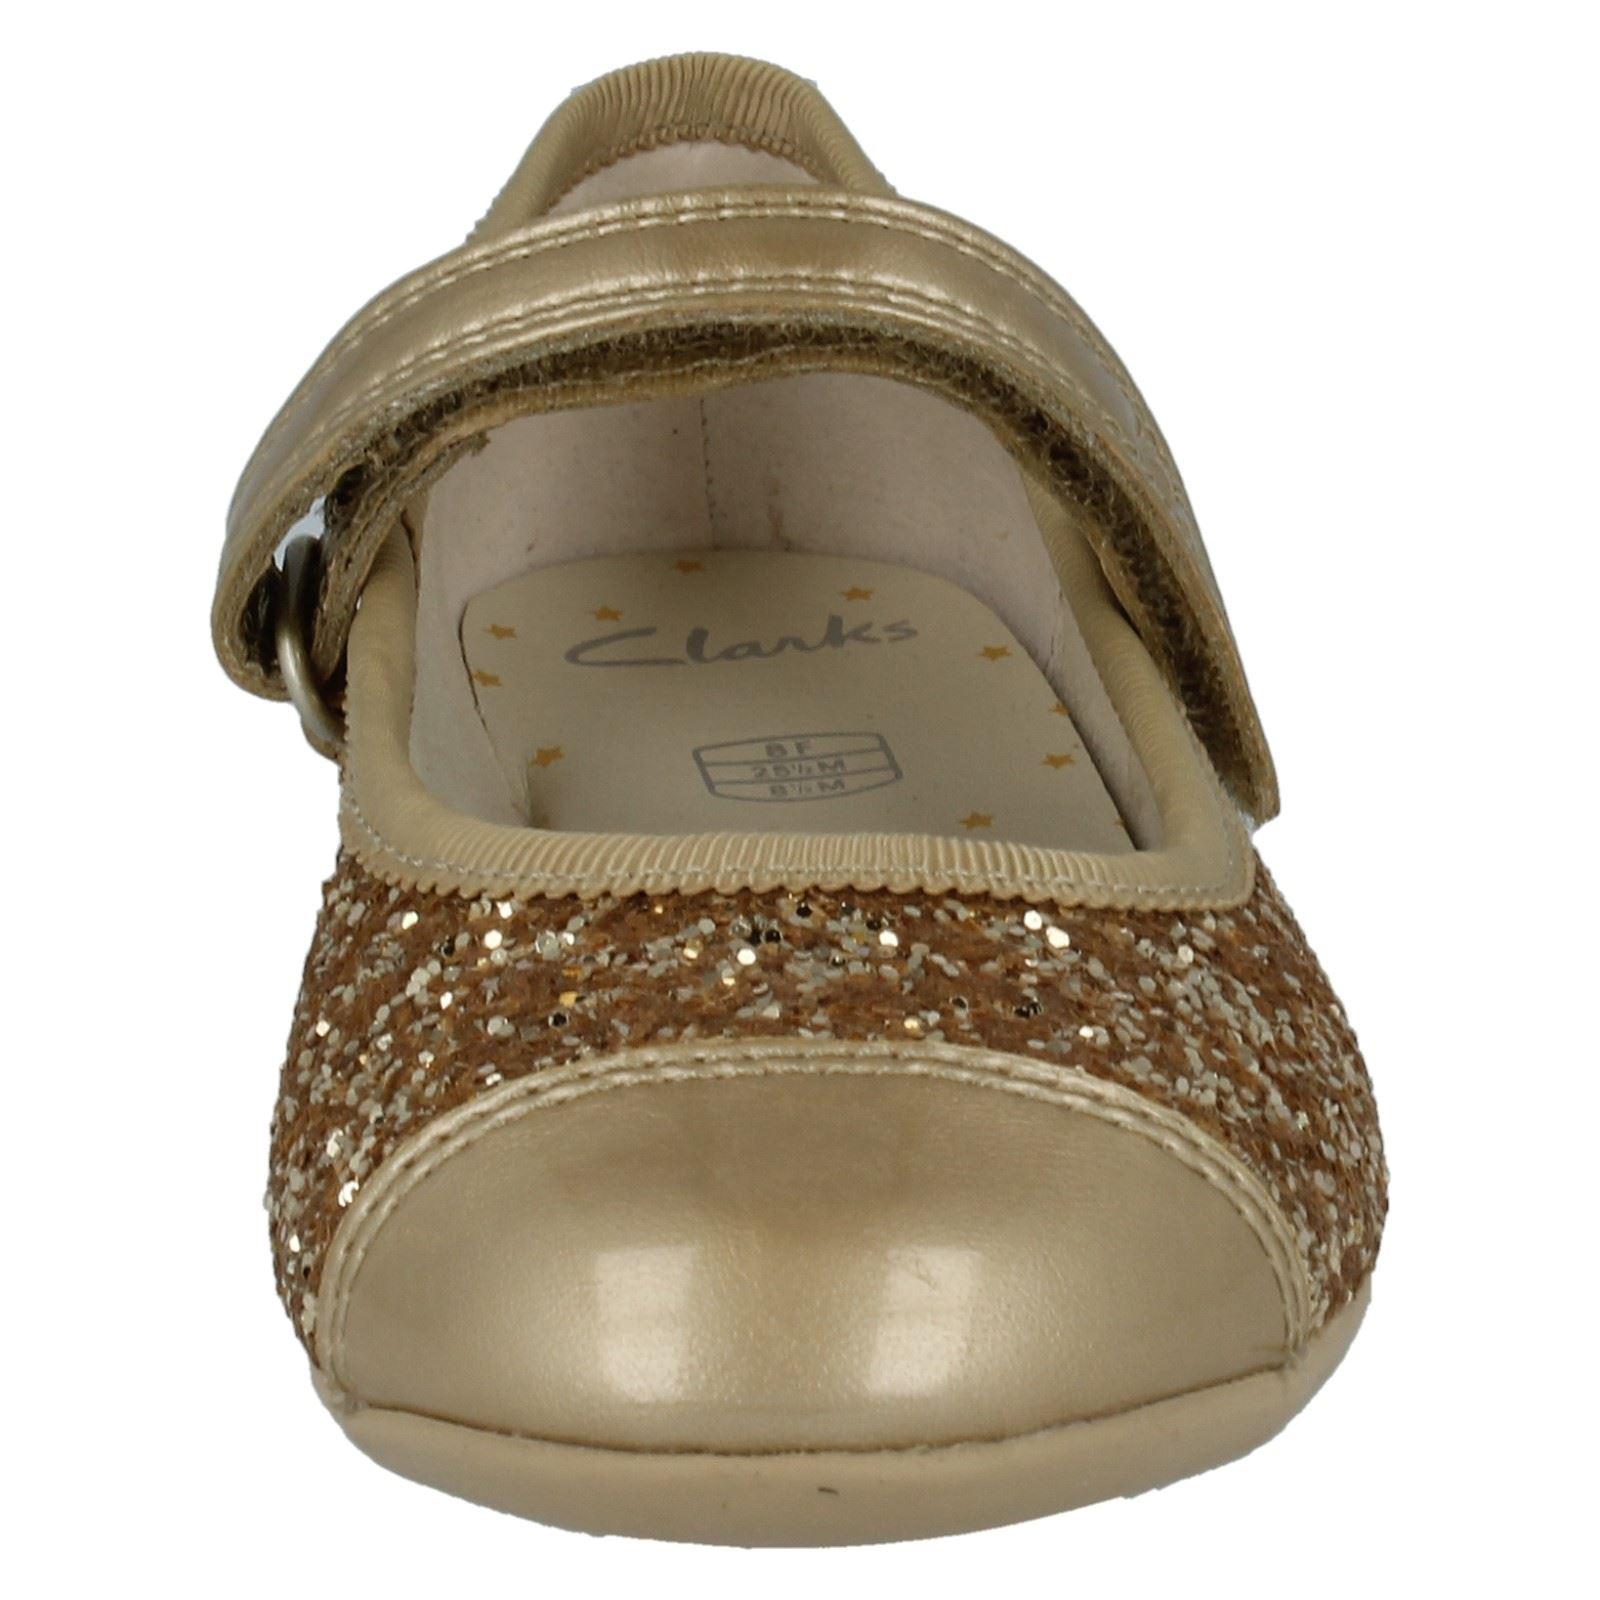 Girls Clarks Shoes Style - Dance Idol Pre